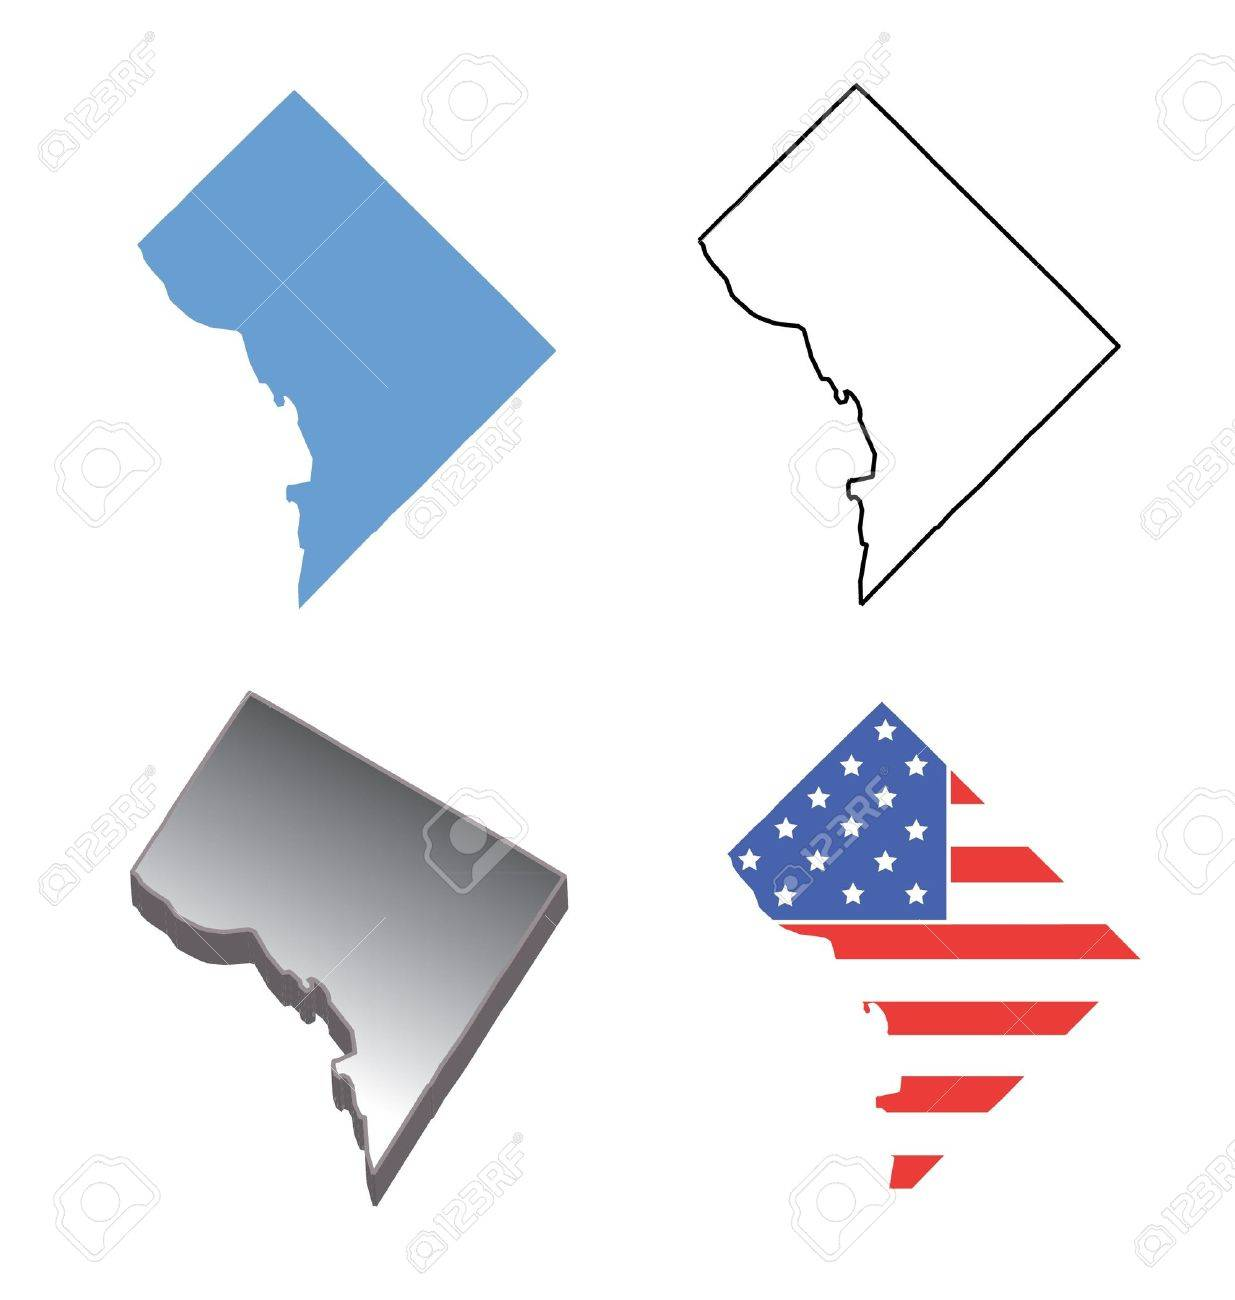 Washington Dc Stock Illustrations Cliparts And Royalty Free - Washington dc pop up map